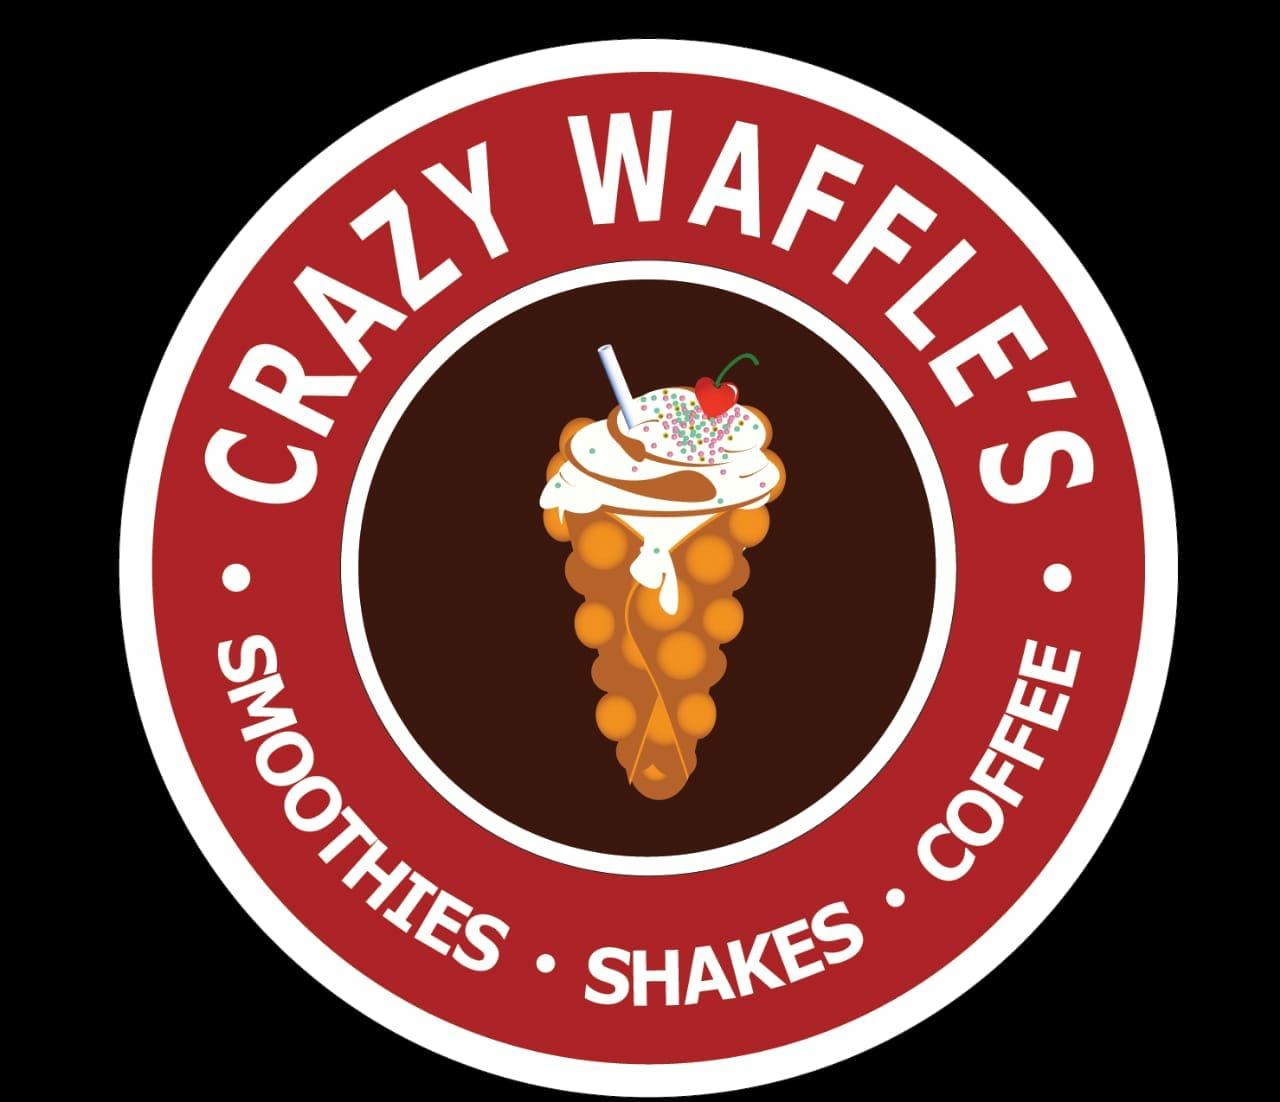 Crazy Waffles